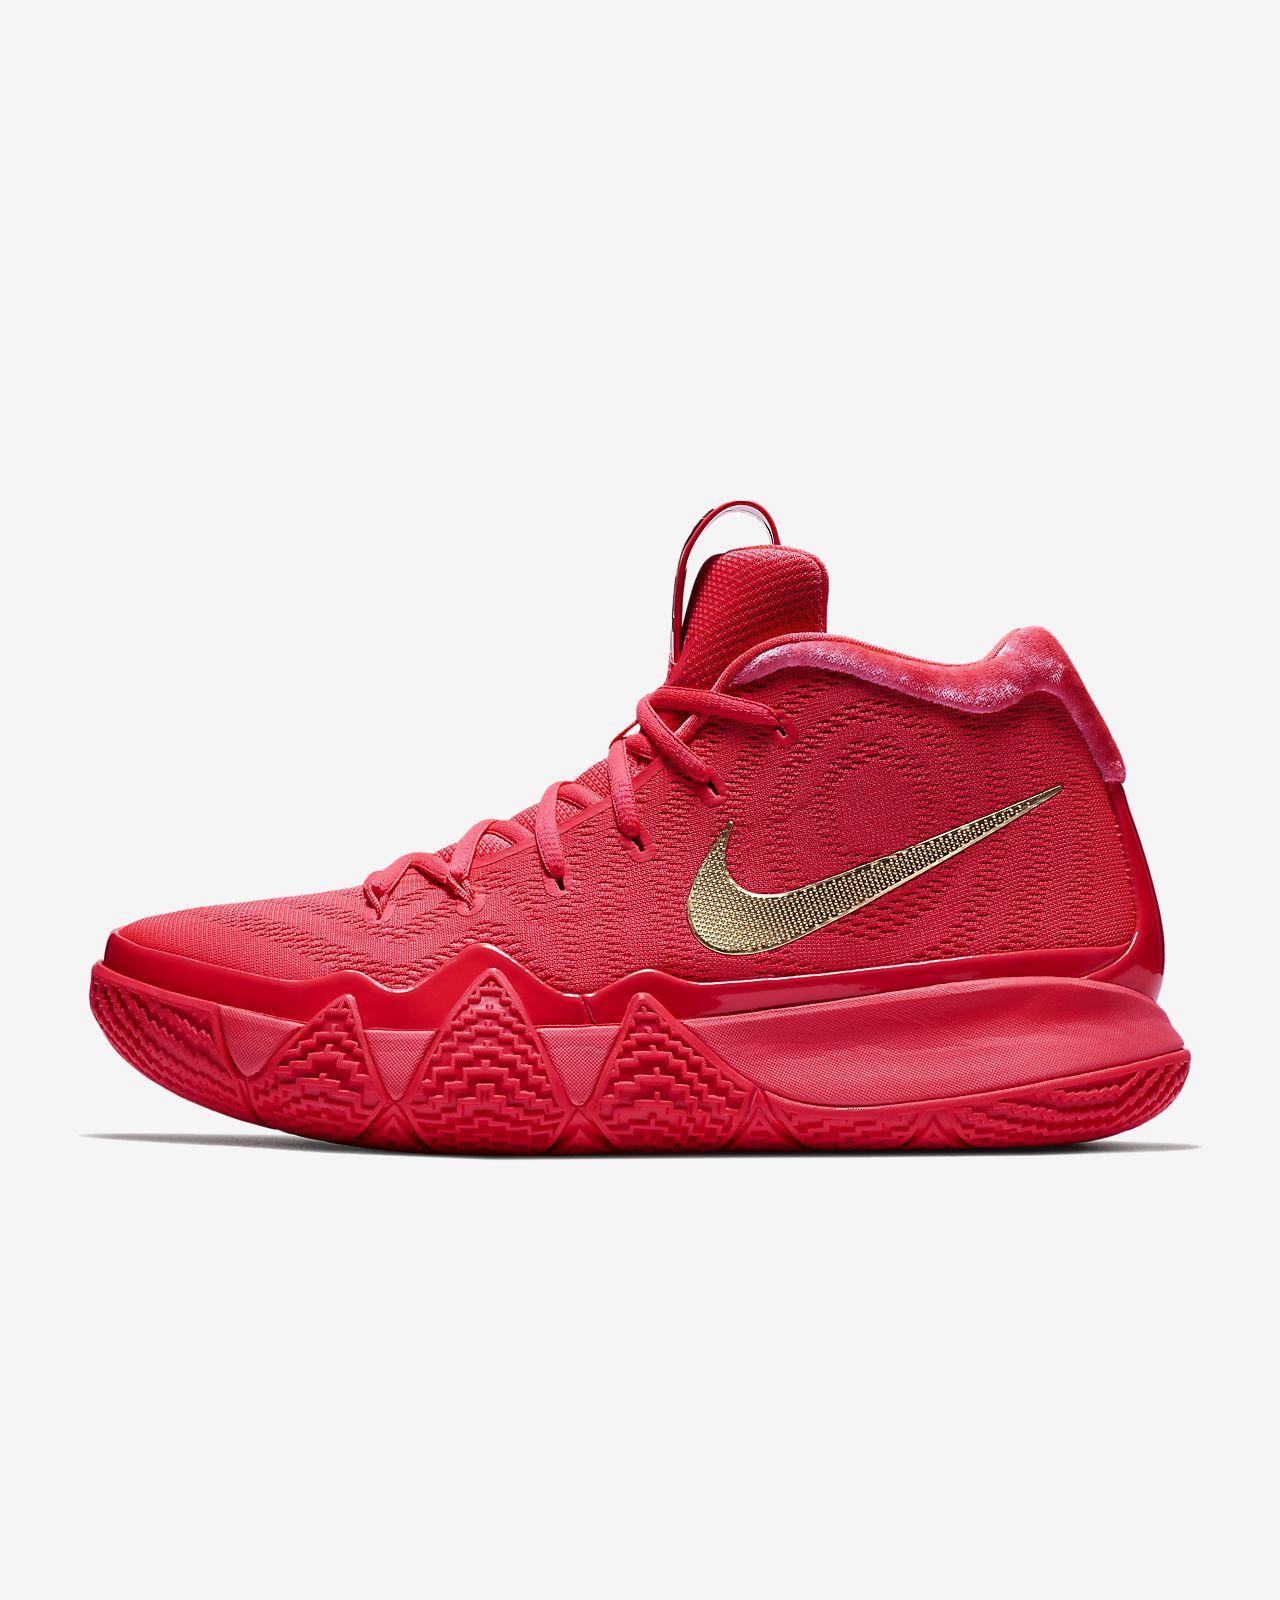 Basketball Shoe Websites For Men